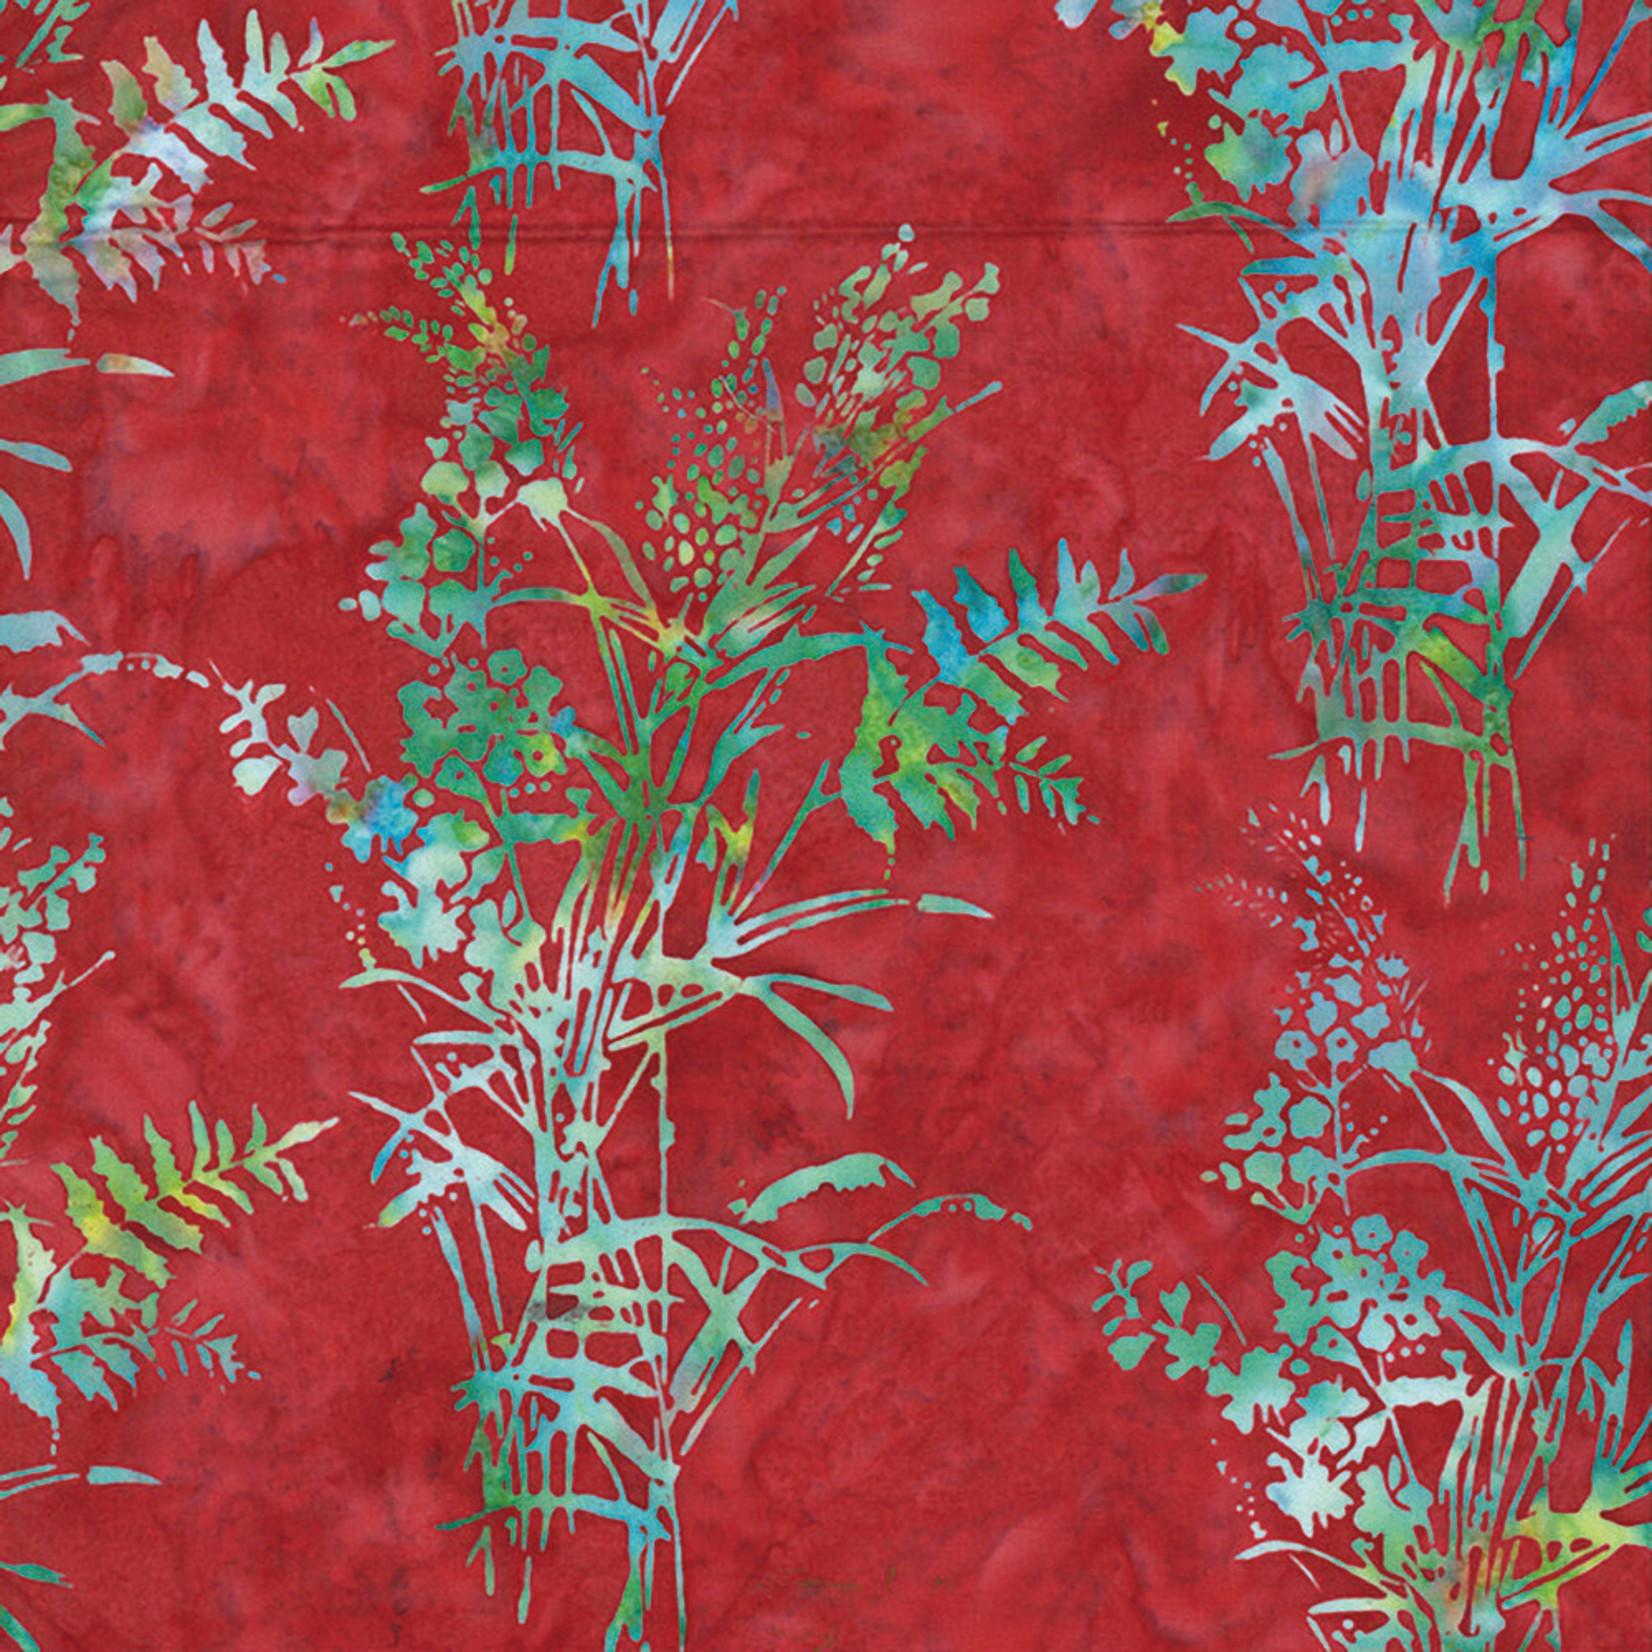 Hoffman Fabrics Bali Batik Bouquet - Cherry